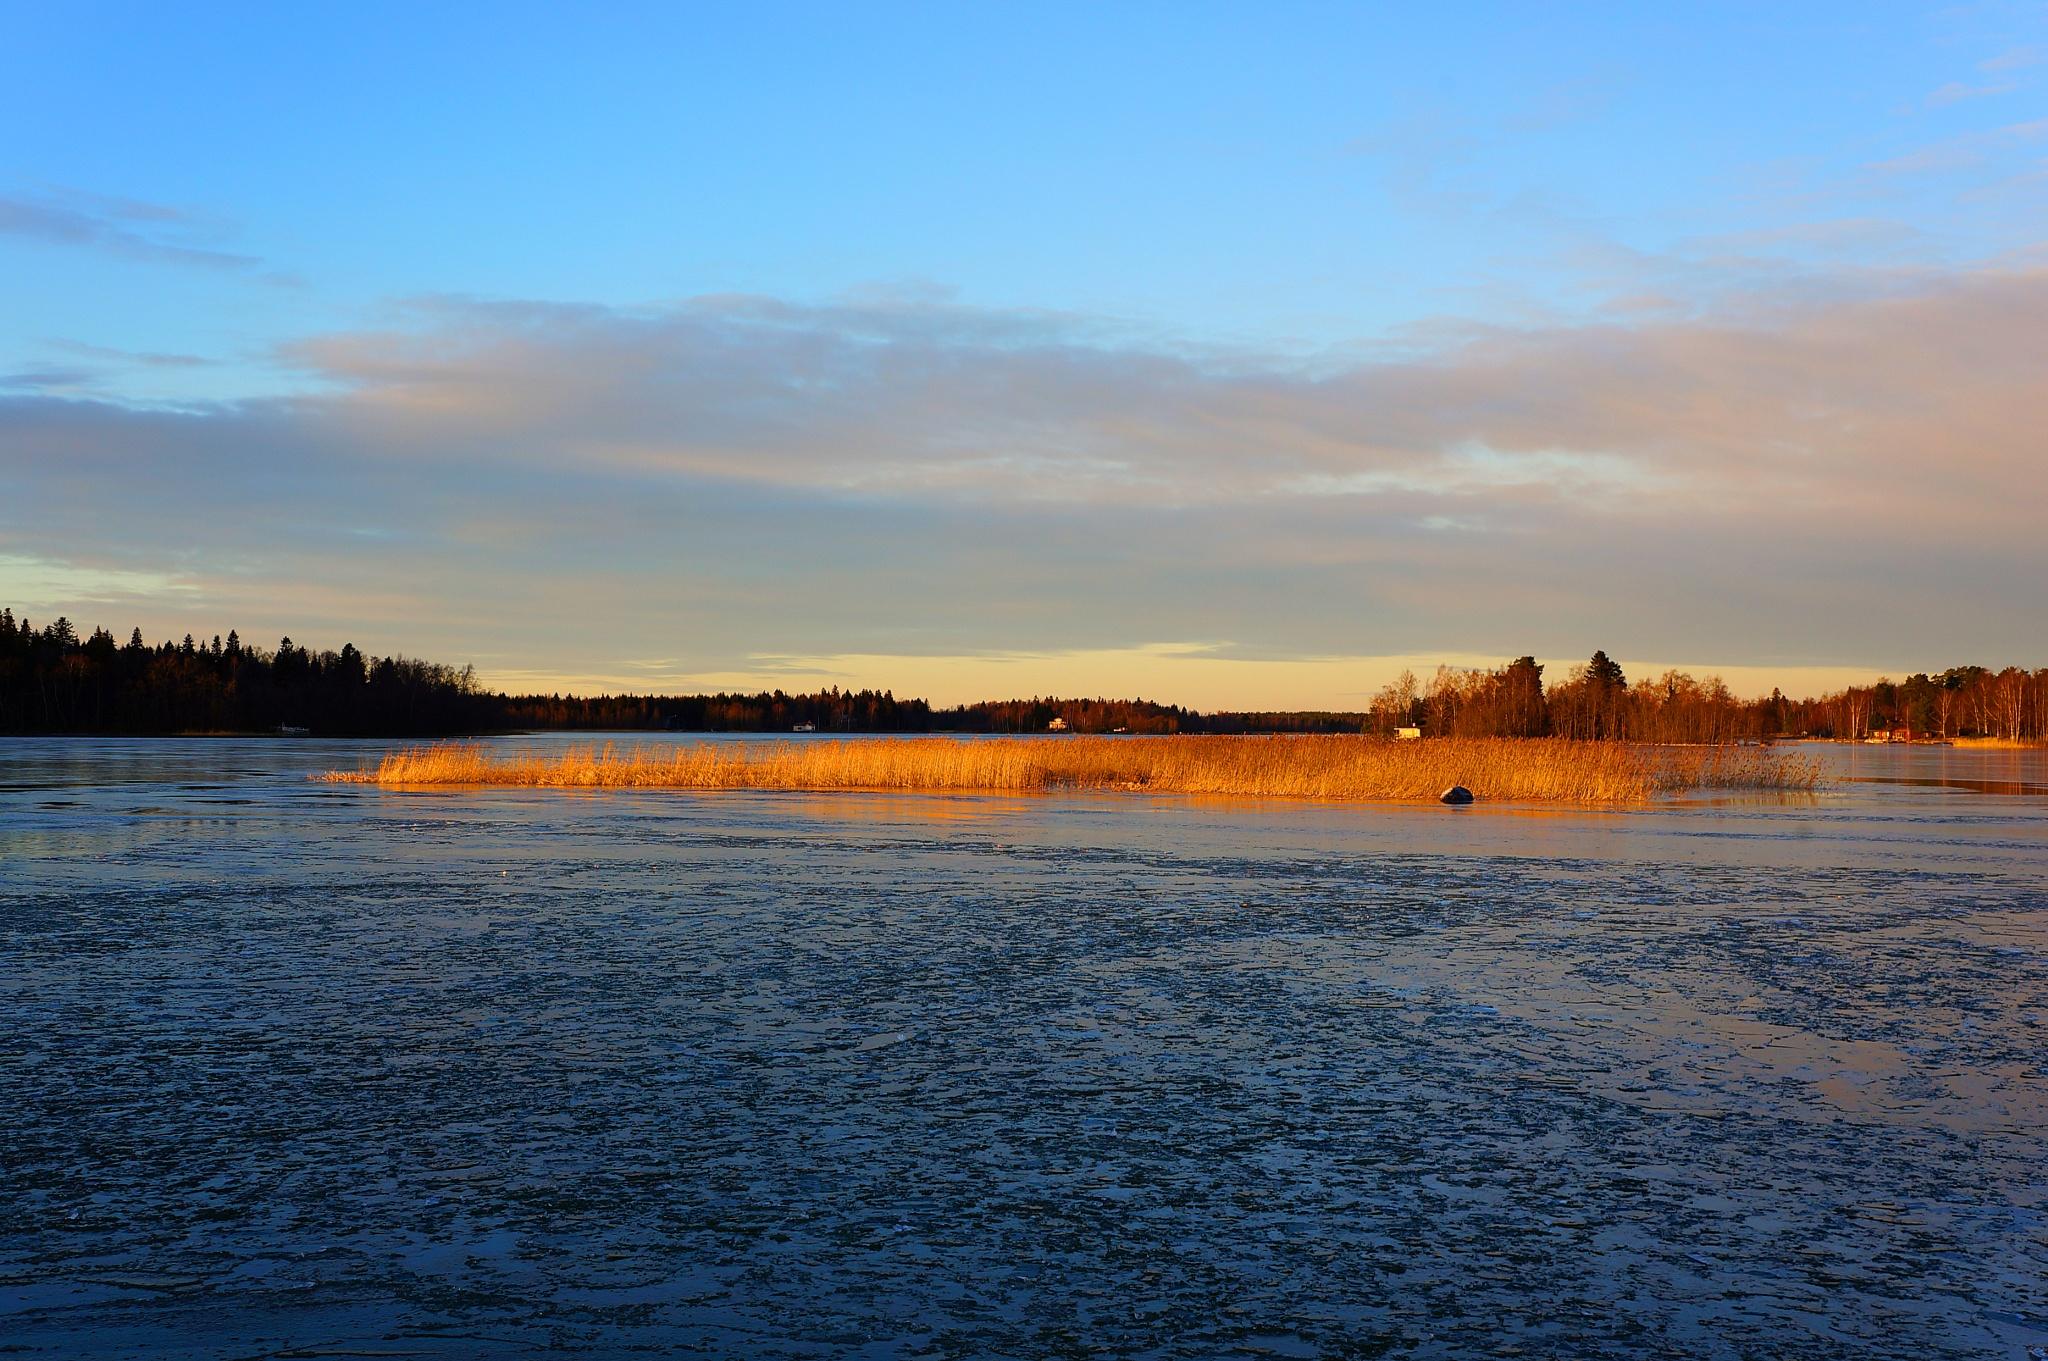 The afternoon sun by Bror Sandås